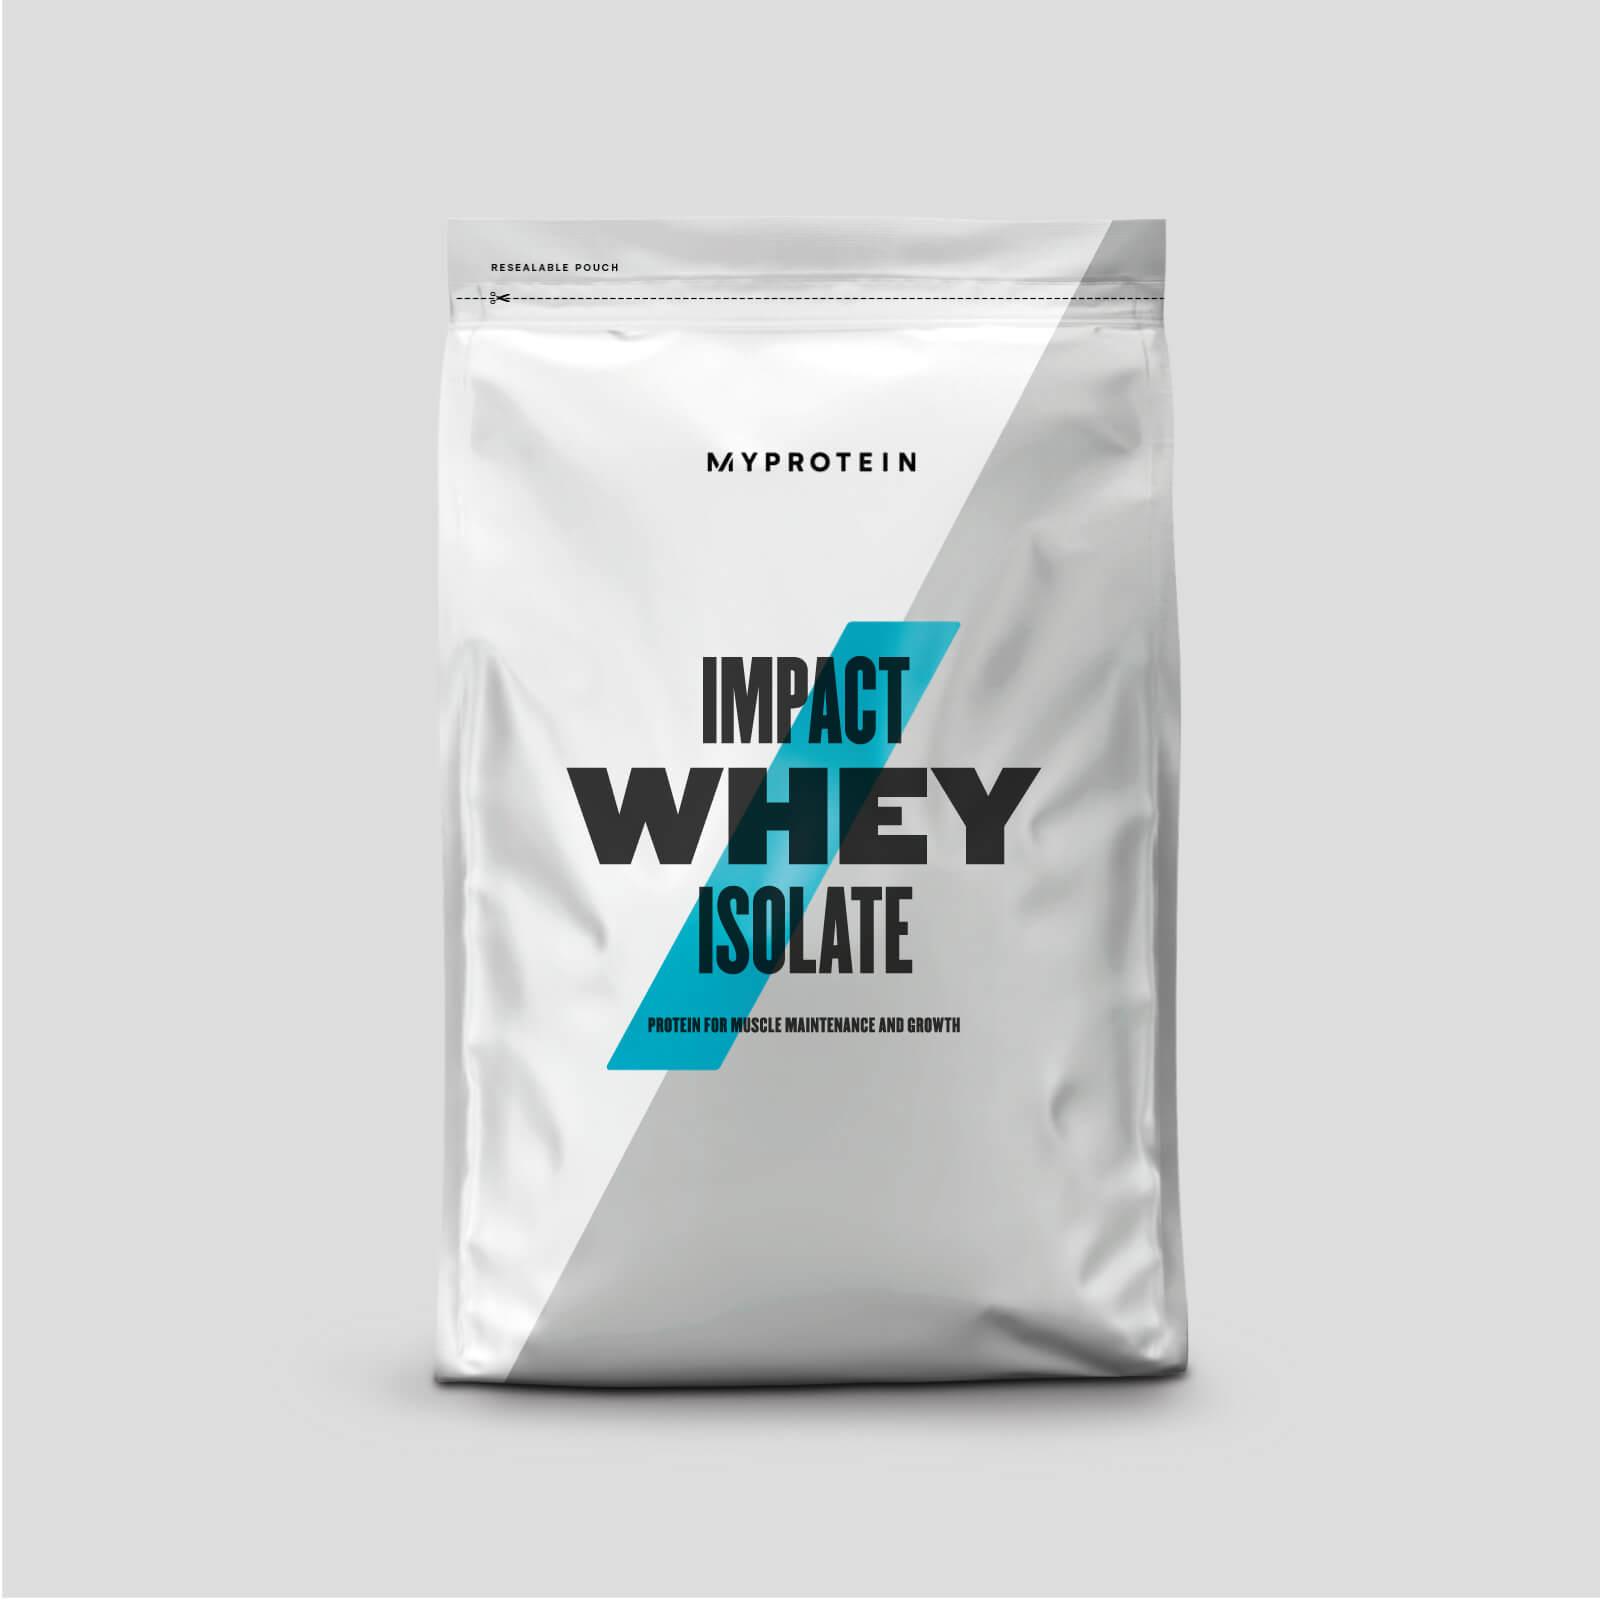 Myprotein Impact Whey Isolate - 1kg - Chocolat Caramel